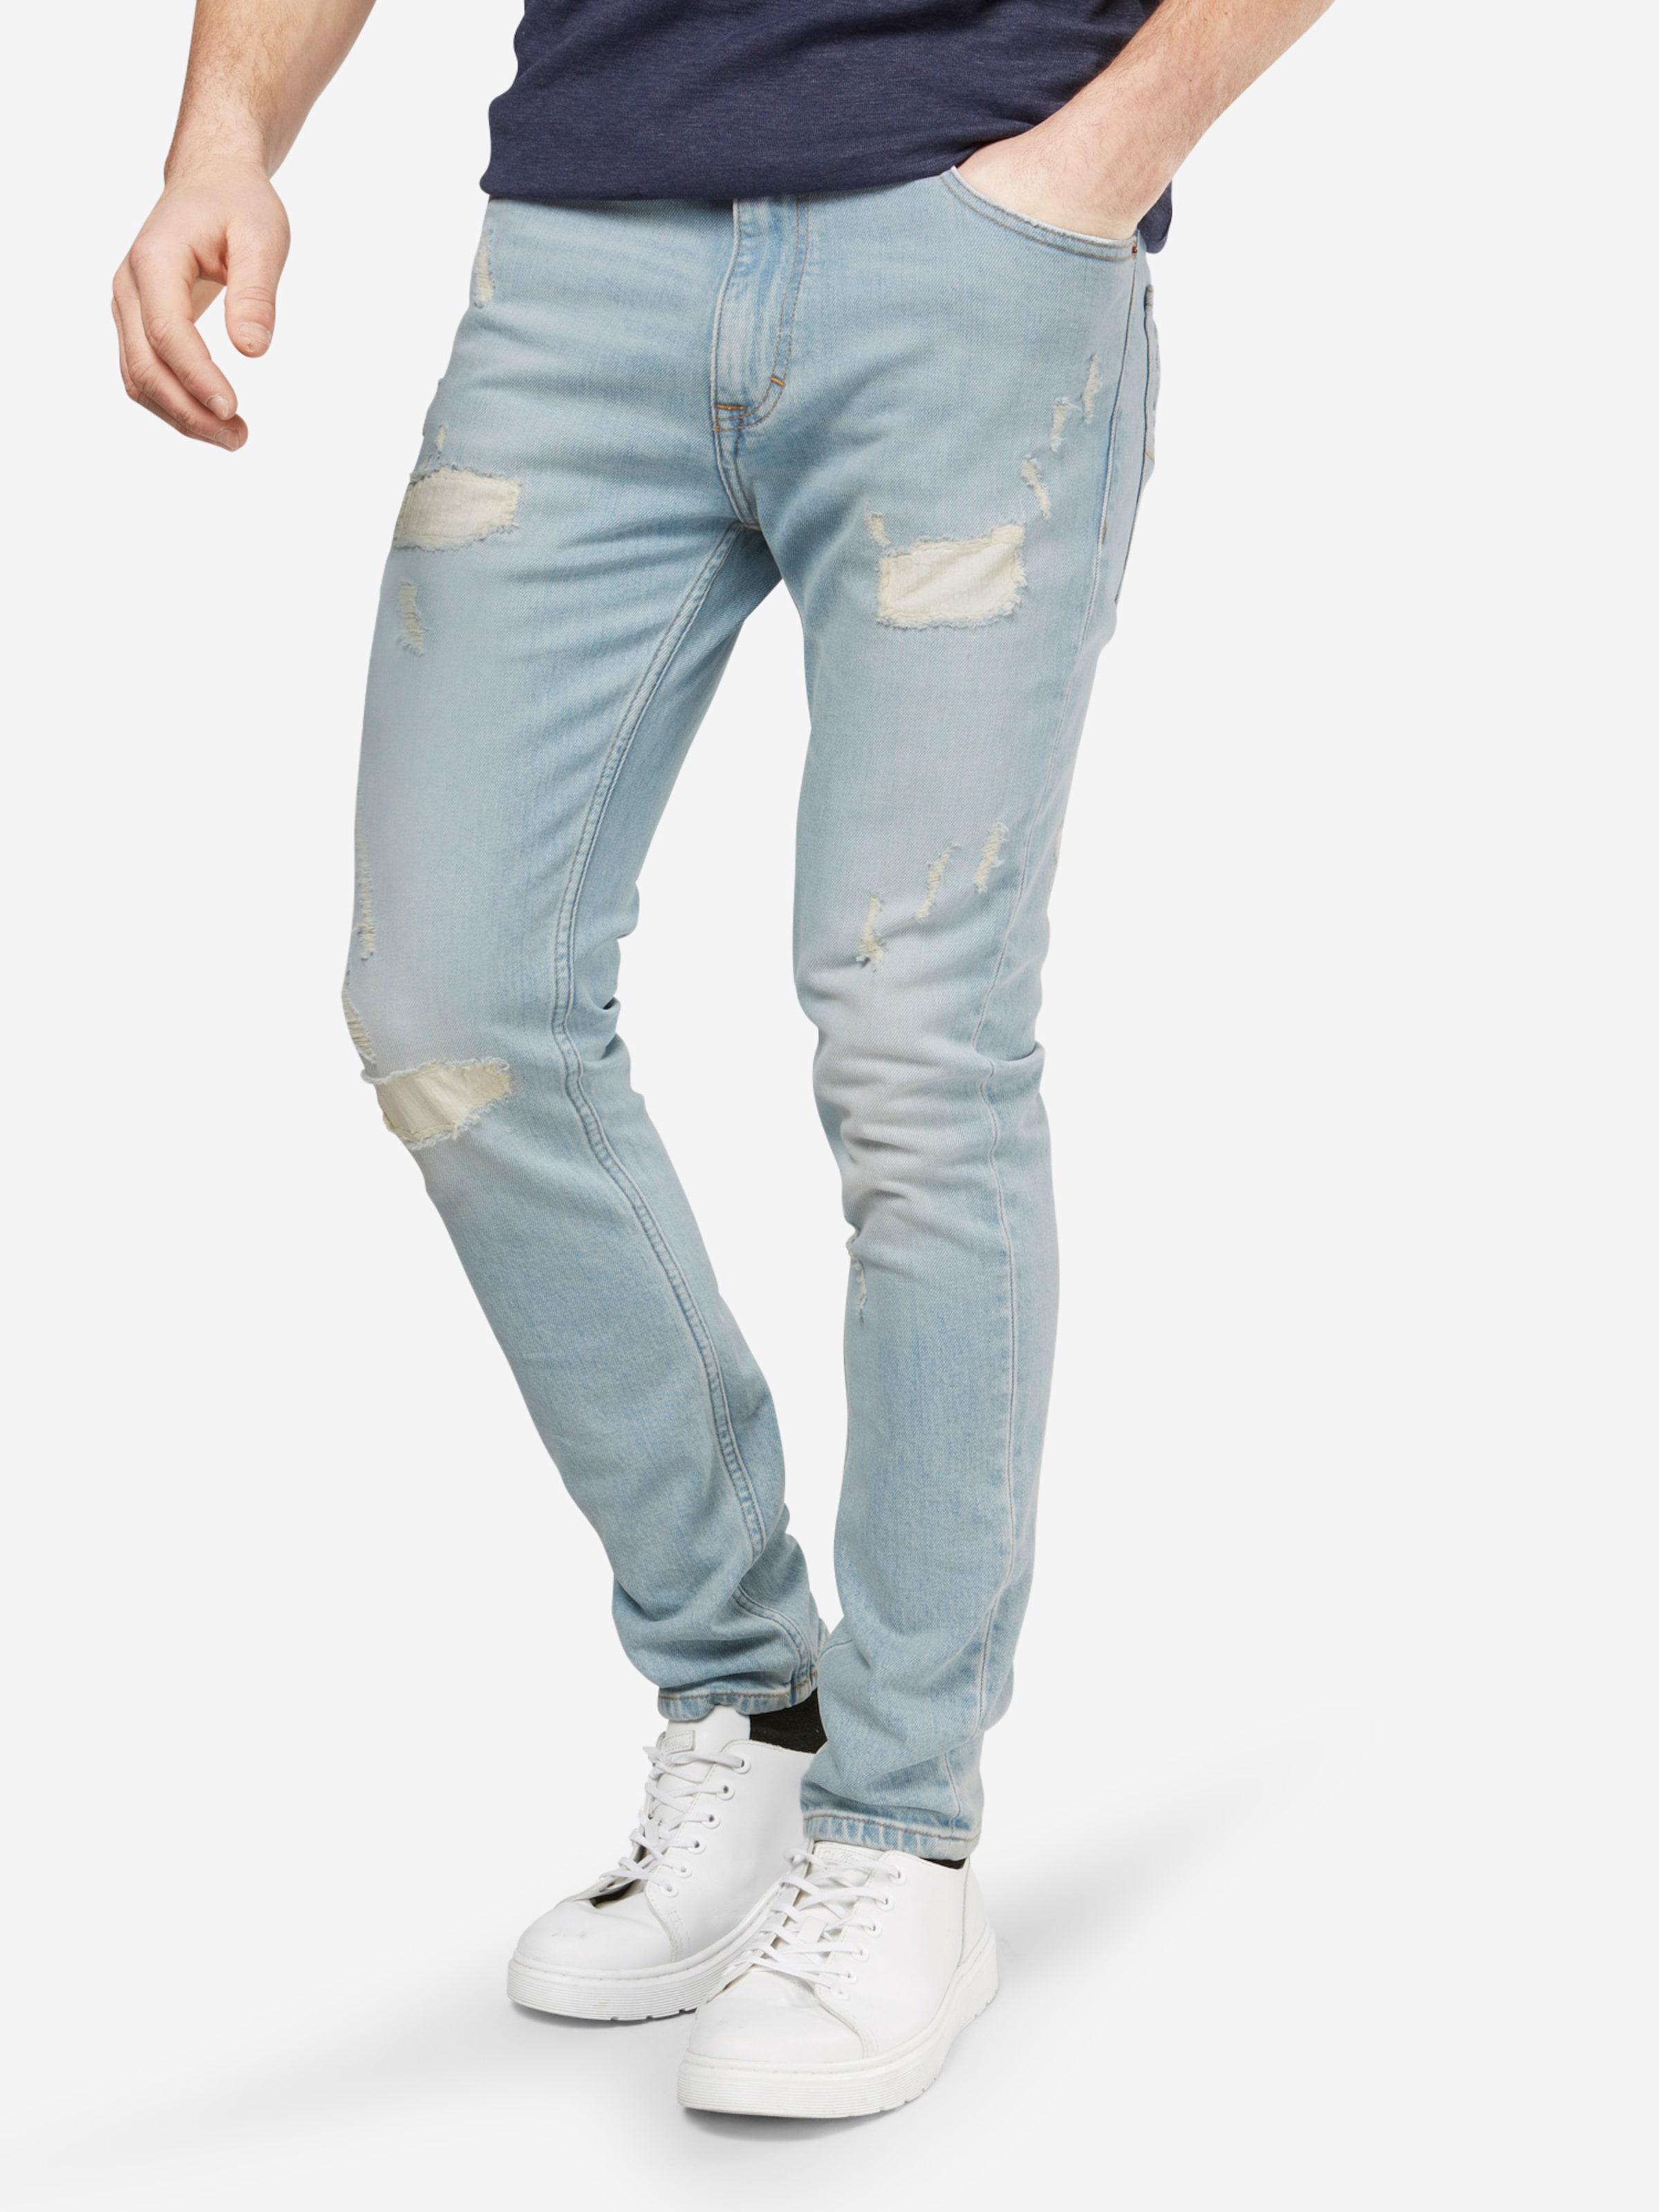 HUGO CMF' Jeans Klein 'SKINNY Calvin DSTR TAPER Jeans BLUE 8xqfXwWwAF